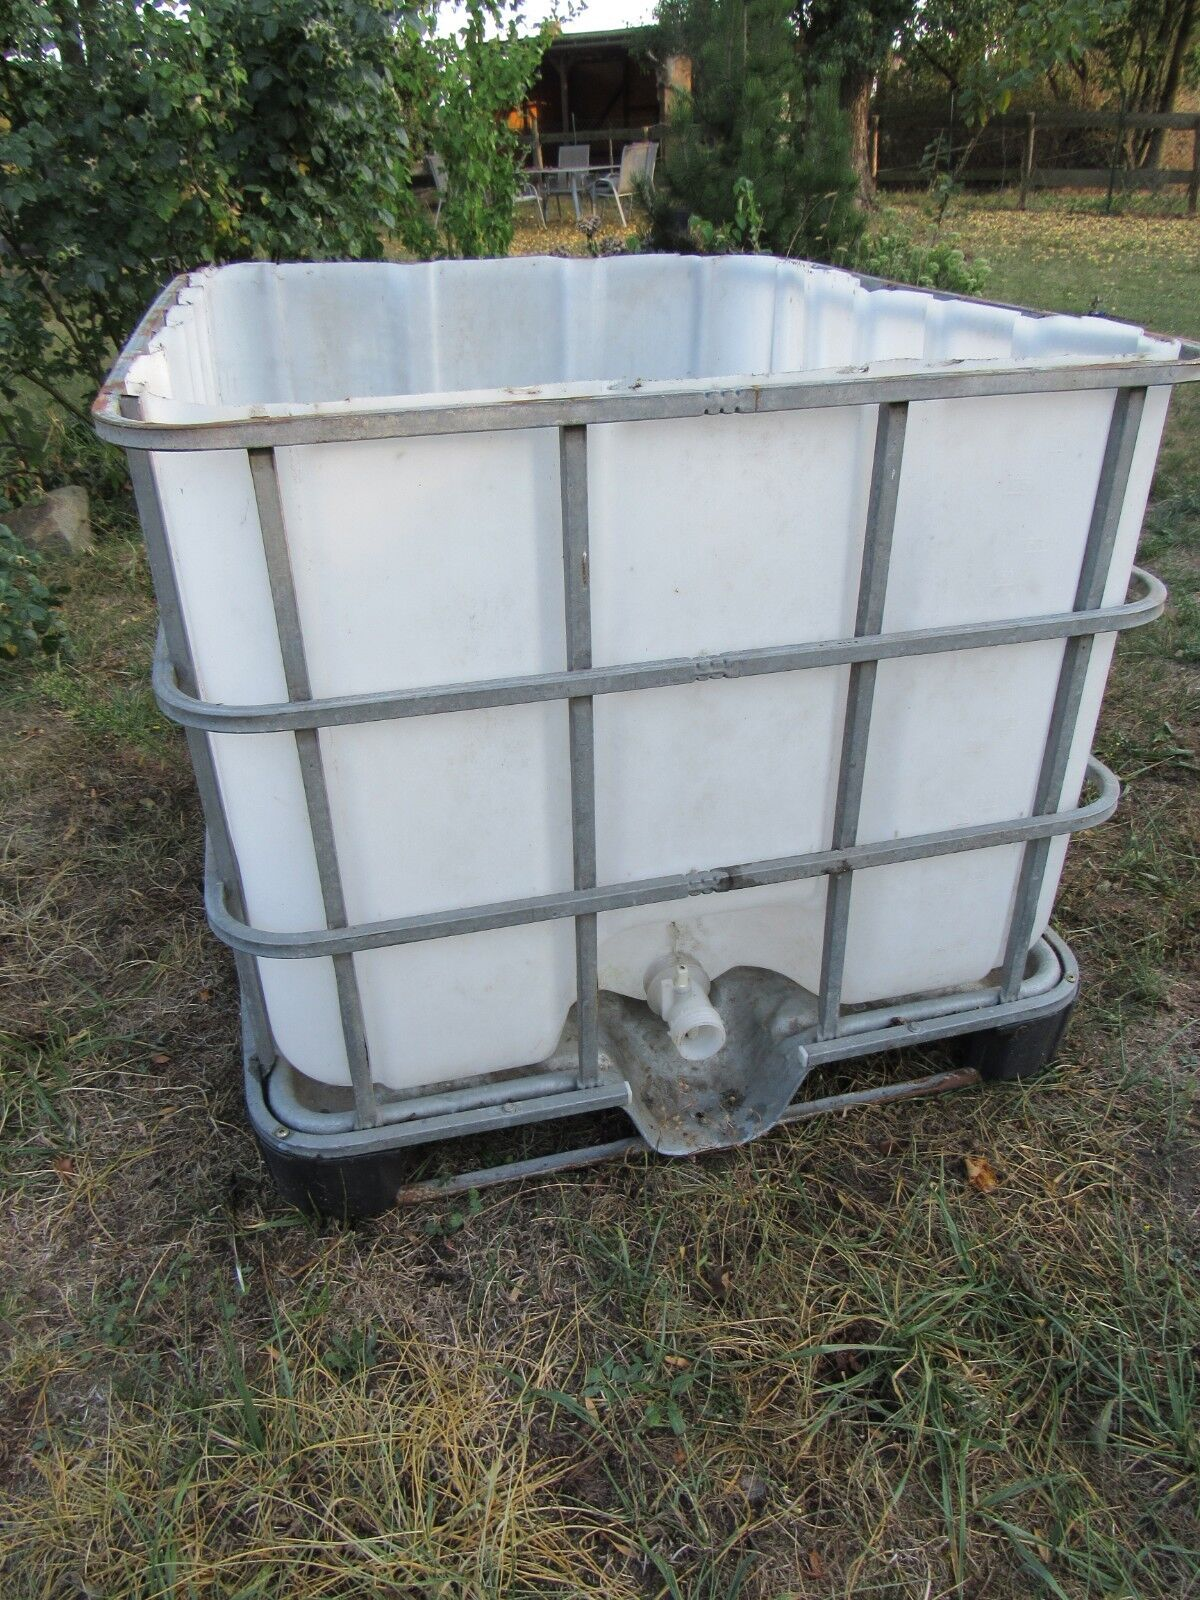 3 Heubehälter Heubehälter Heubehälter für Koppel aus wetterfestem Kunstoff im Metallkorb fedc7c